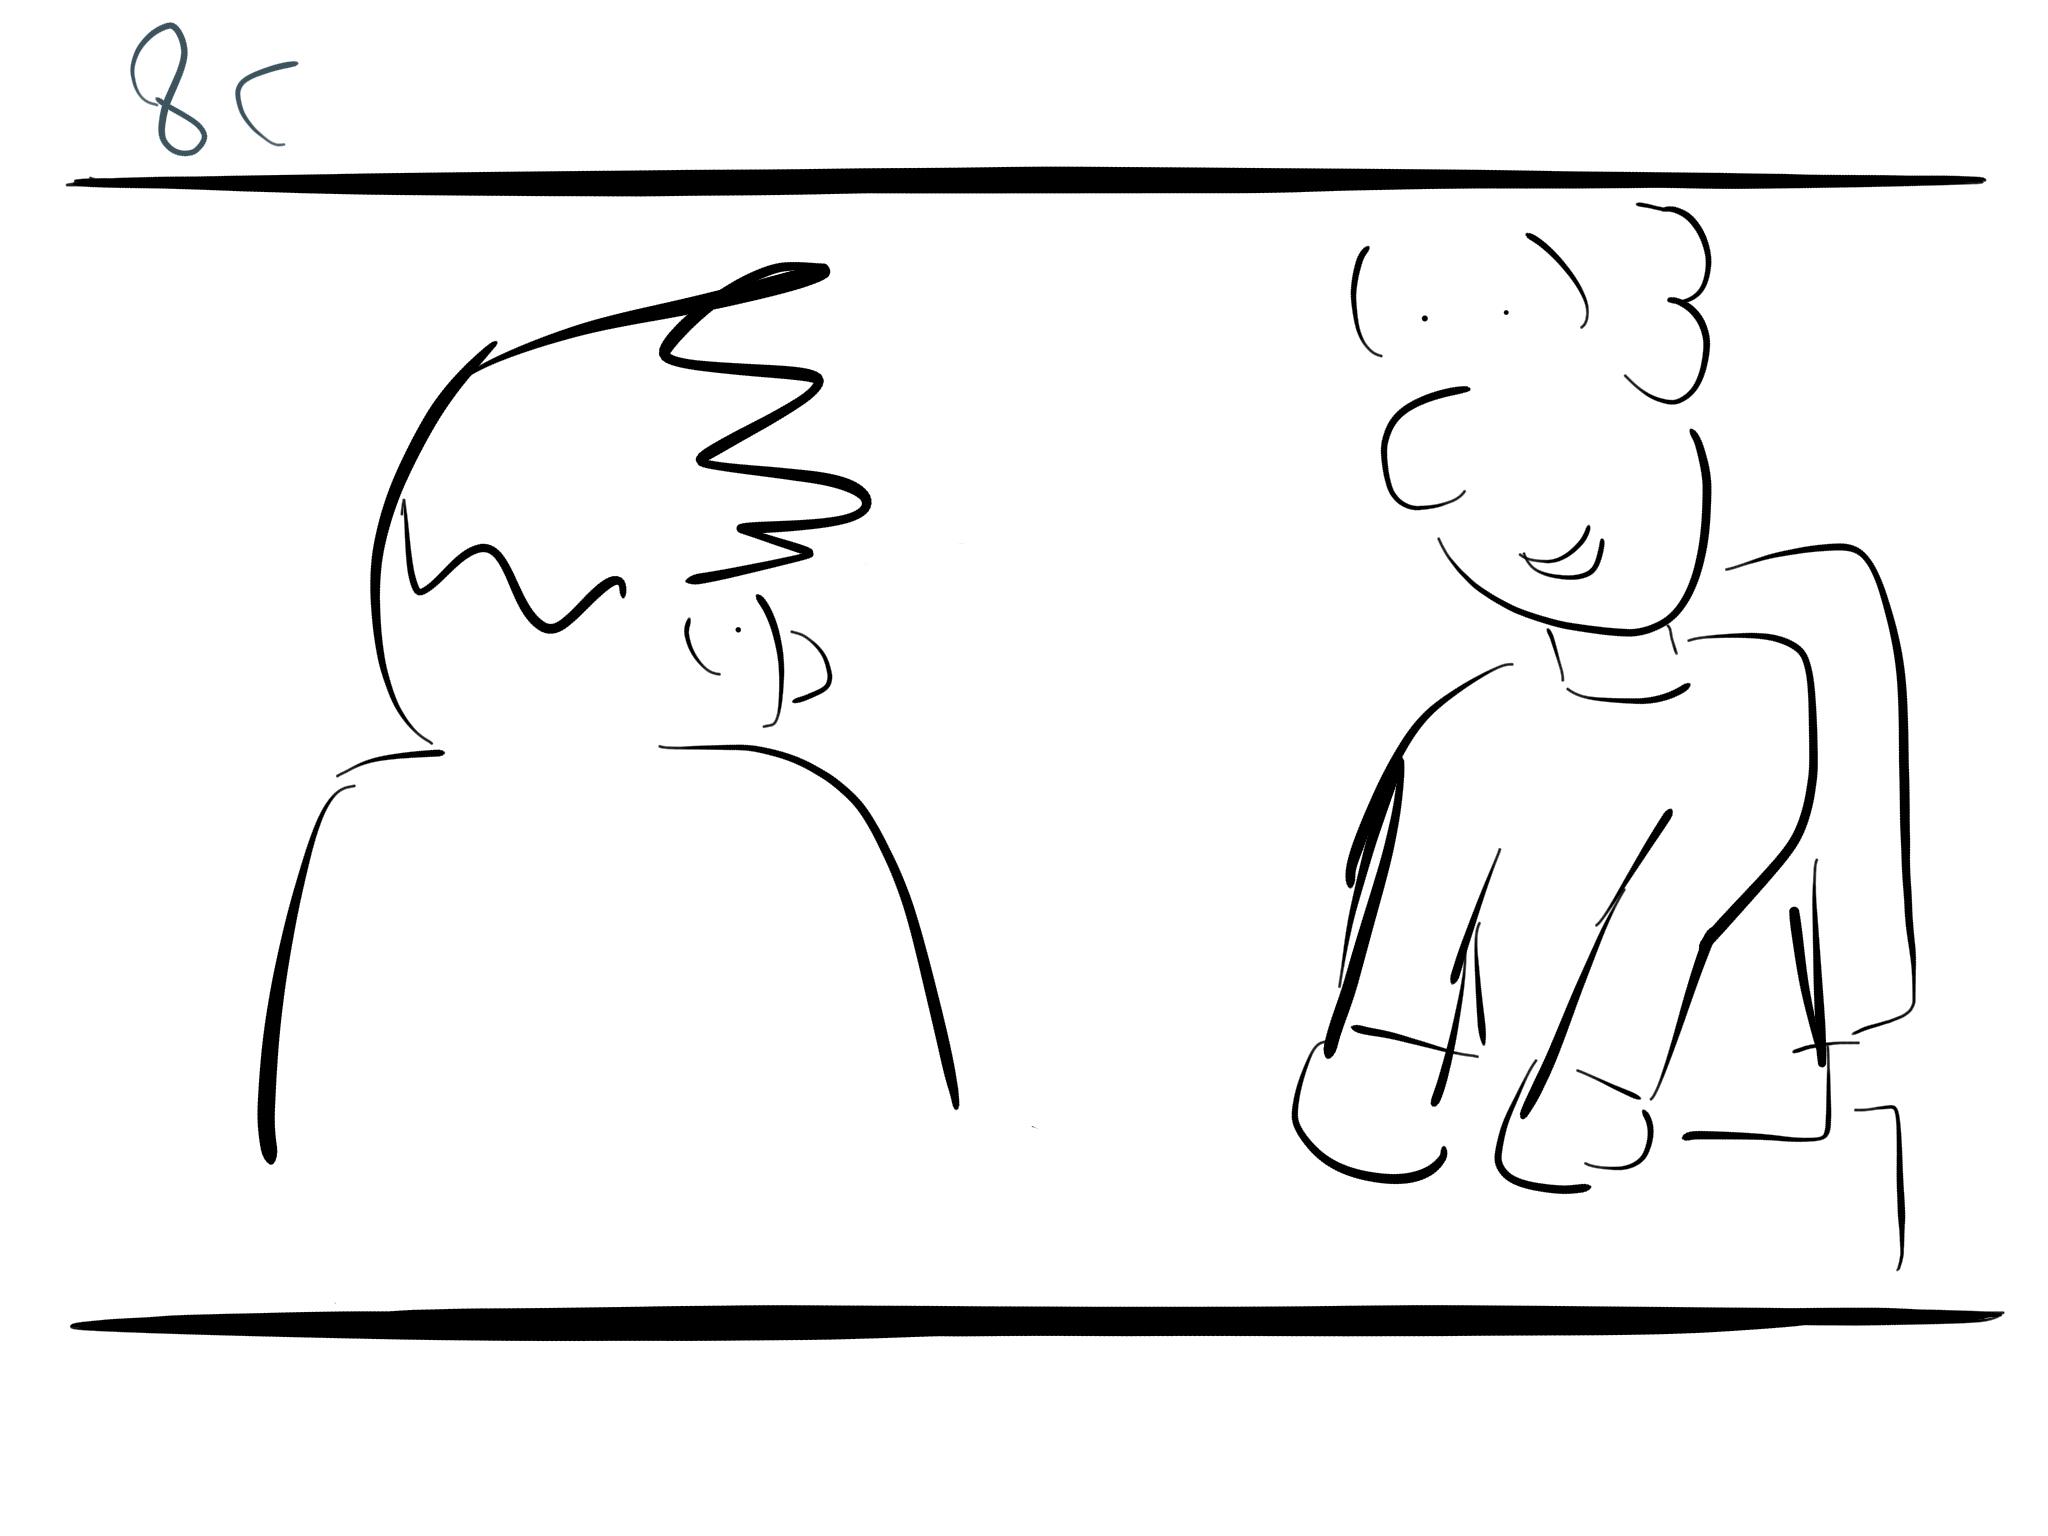 BDF_Storyboards_37.jpg